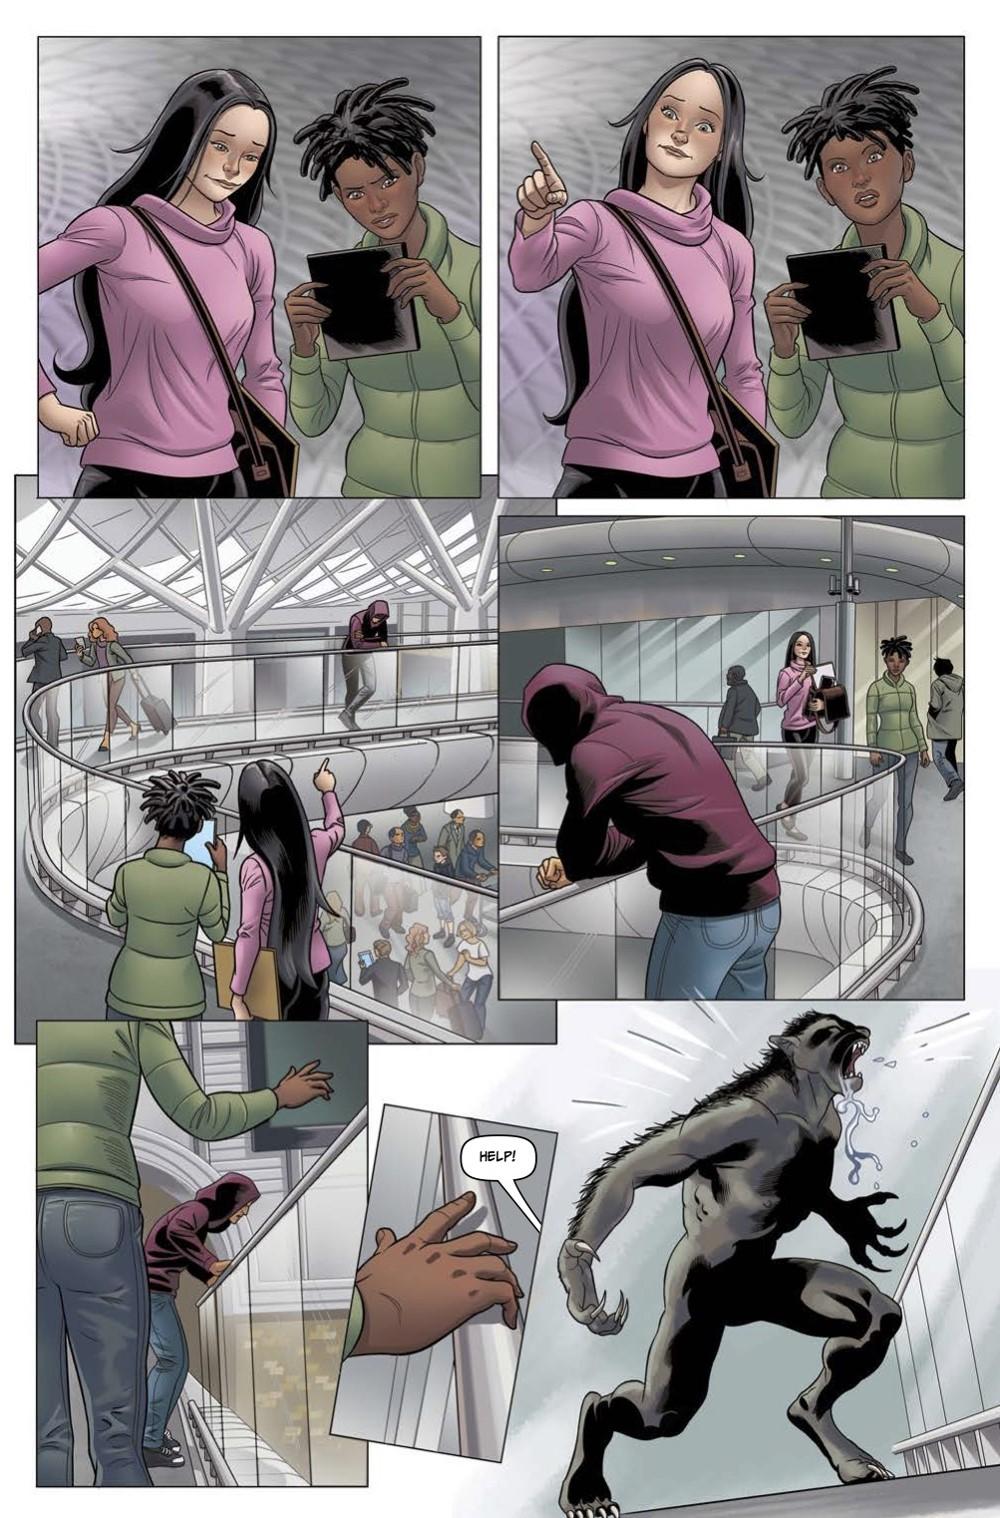 ROL-Monday-Monday-4-Page-4 ComicList Previews: RIVERS OF LONDON MONDAY MONDAY #4